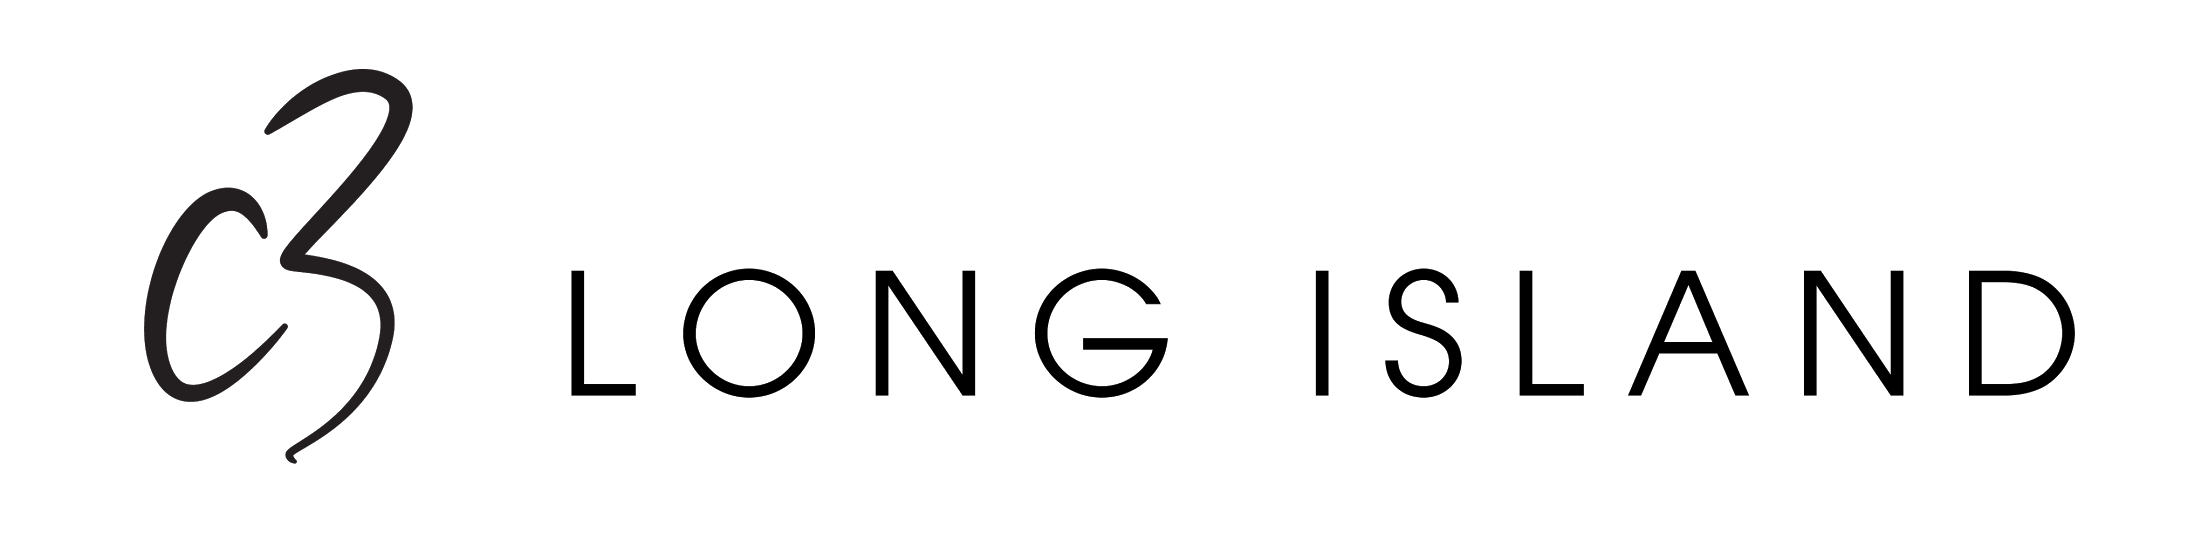 Leadership Connect logo